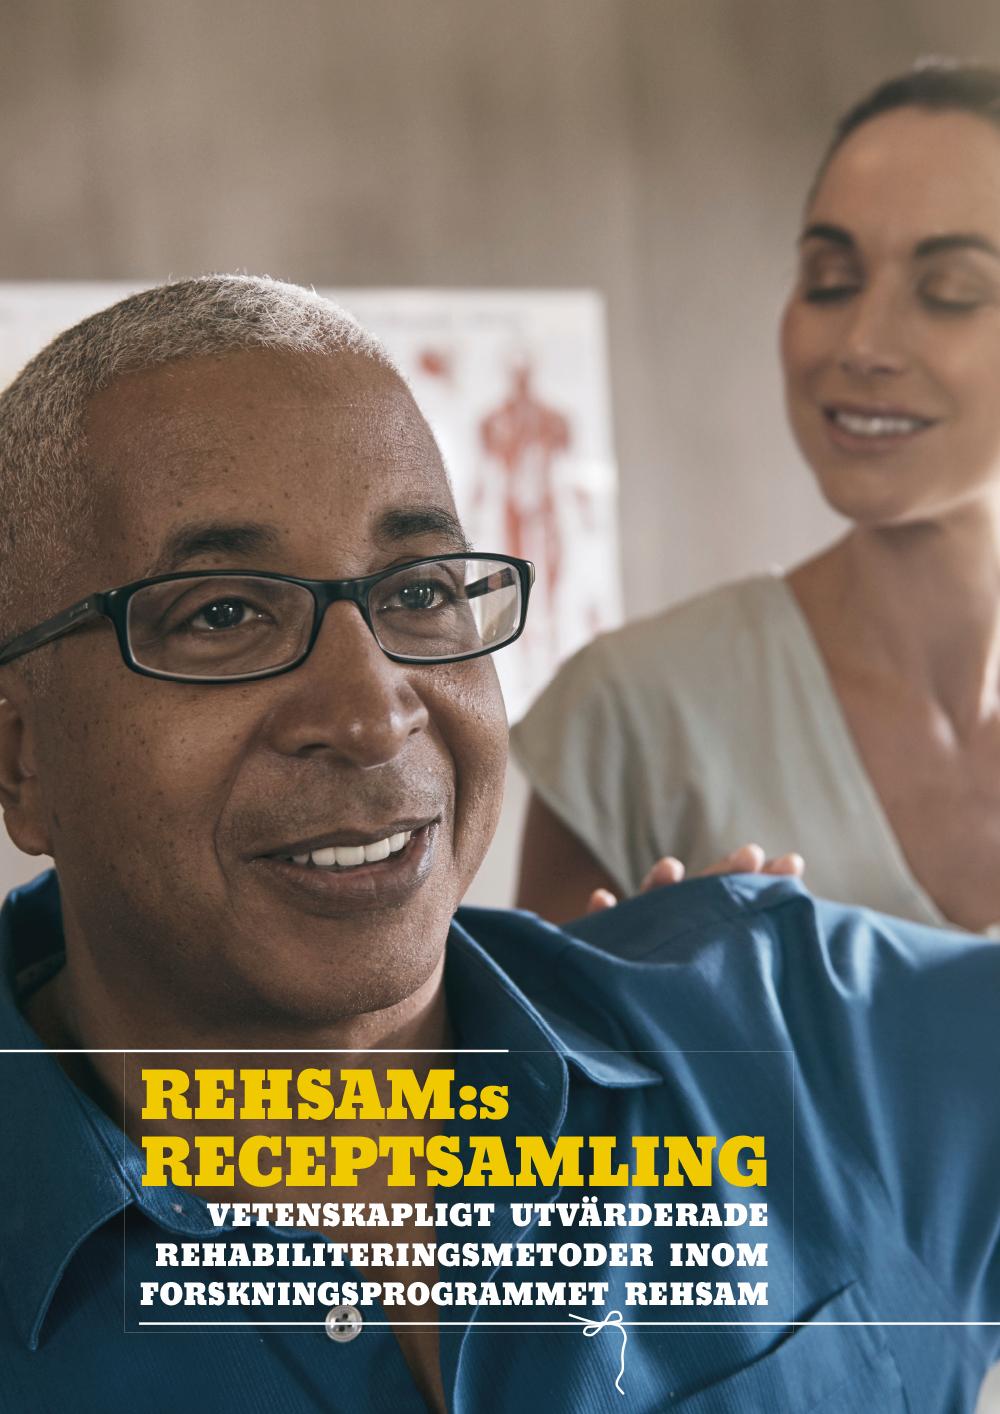 Rehabiliteringsmetoder inom Rehsam